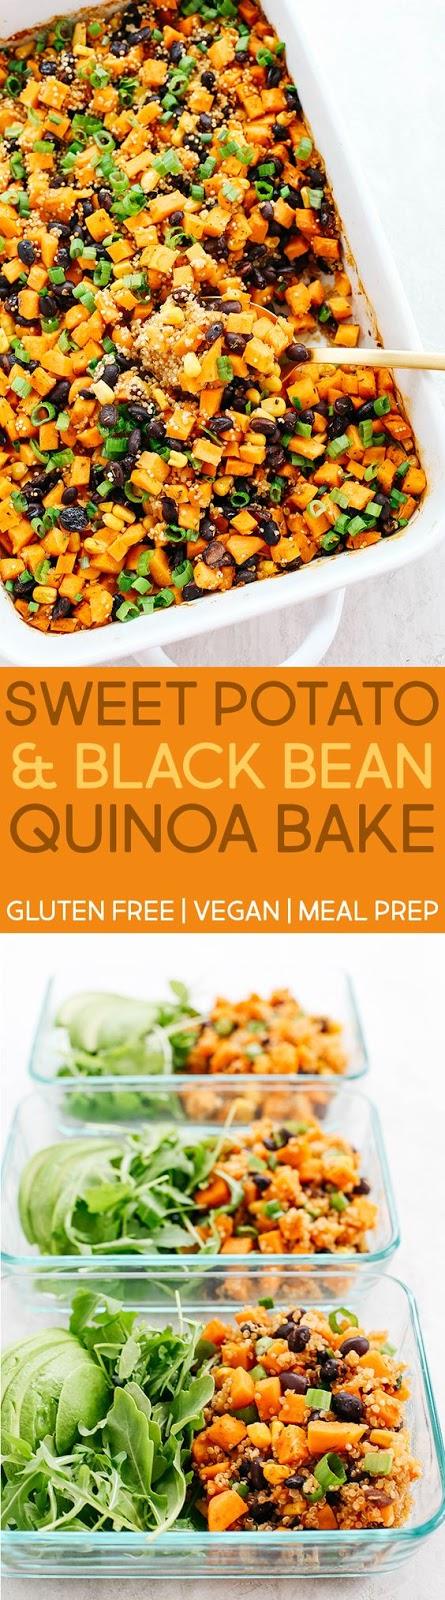 Sweet Potato & Black Bean Quínoa Bake